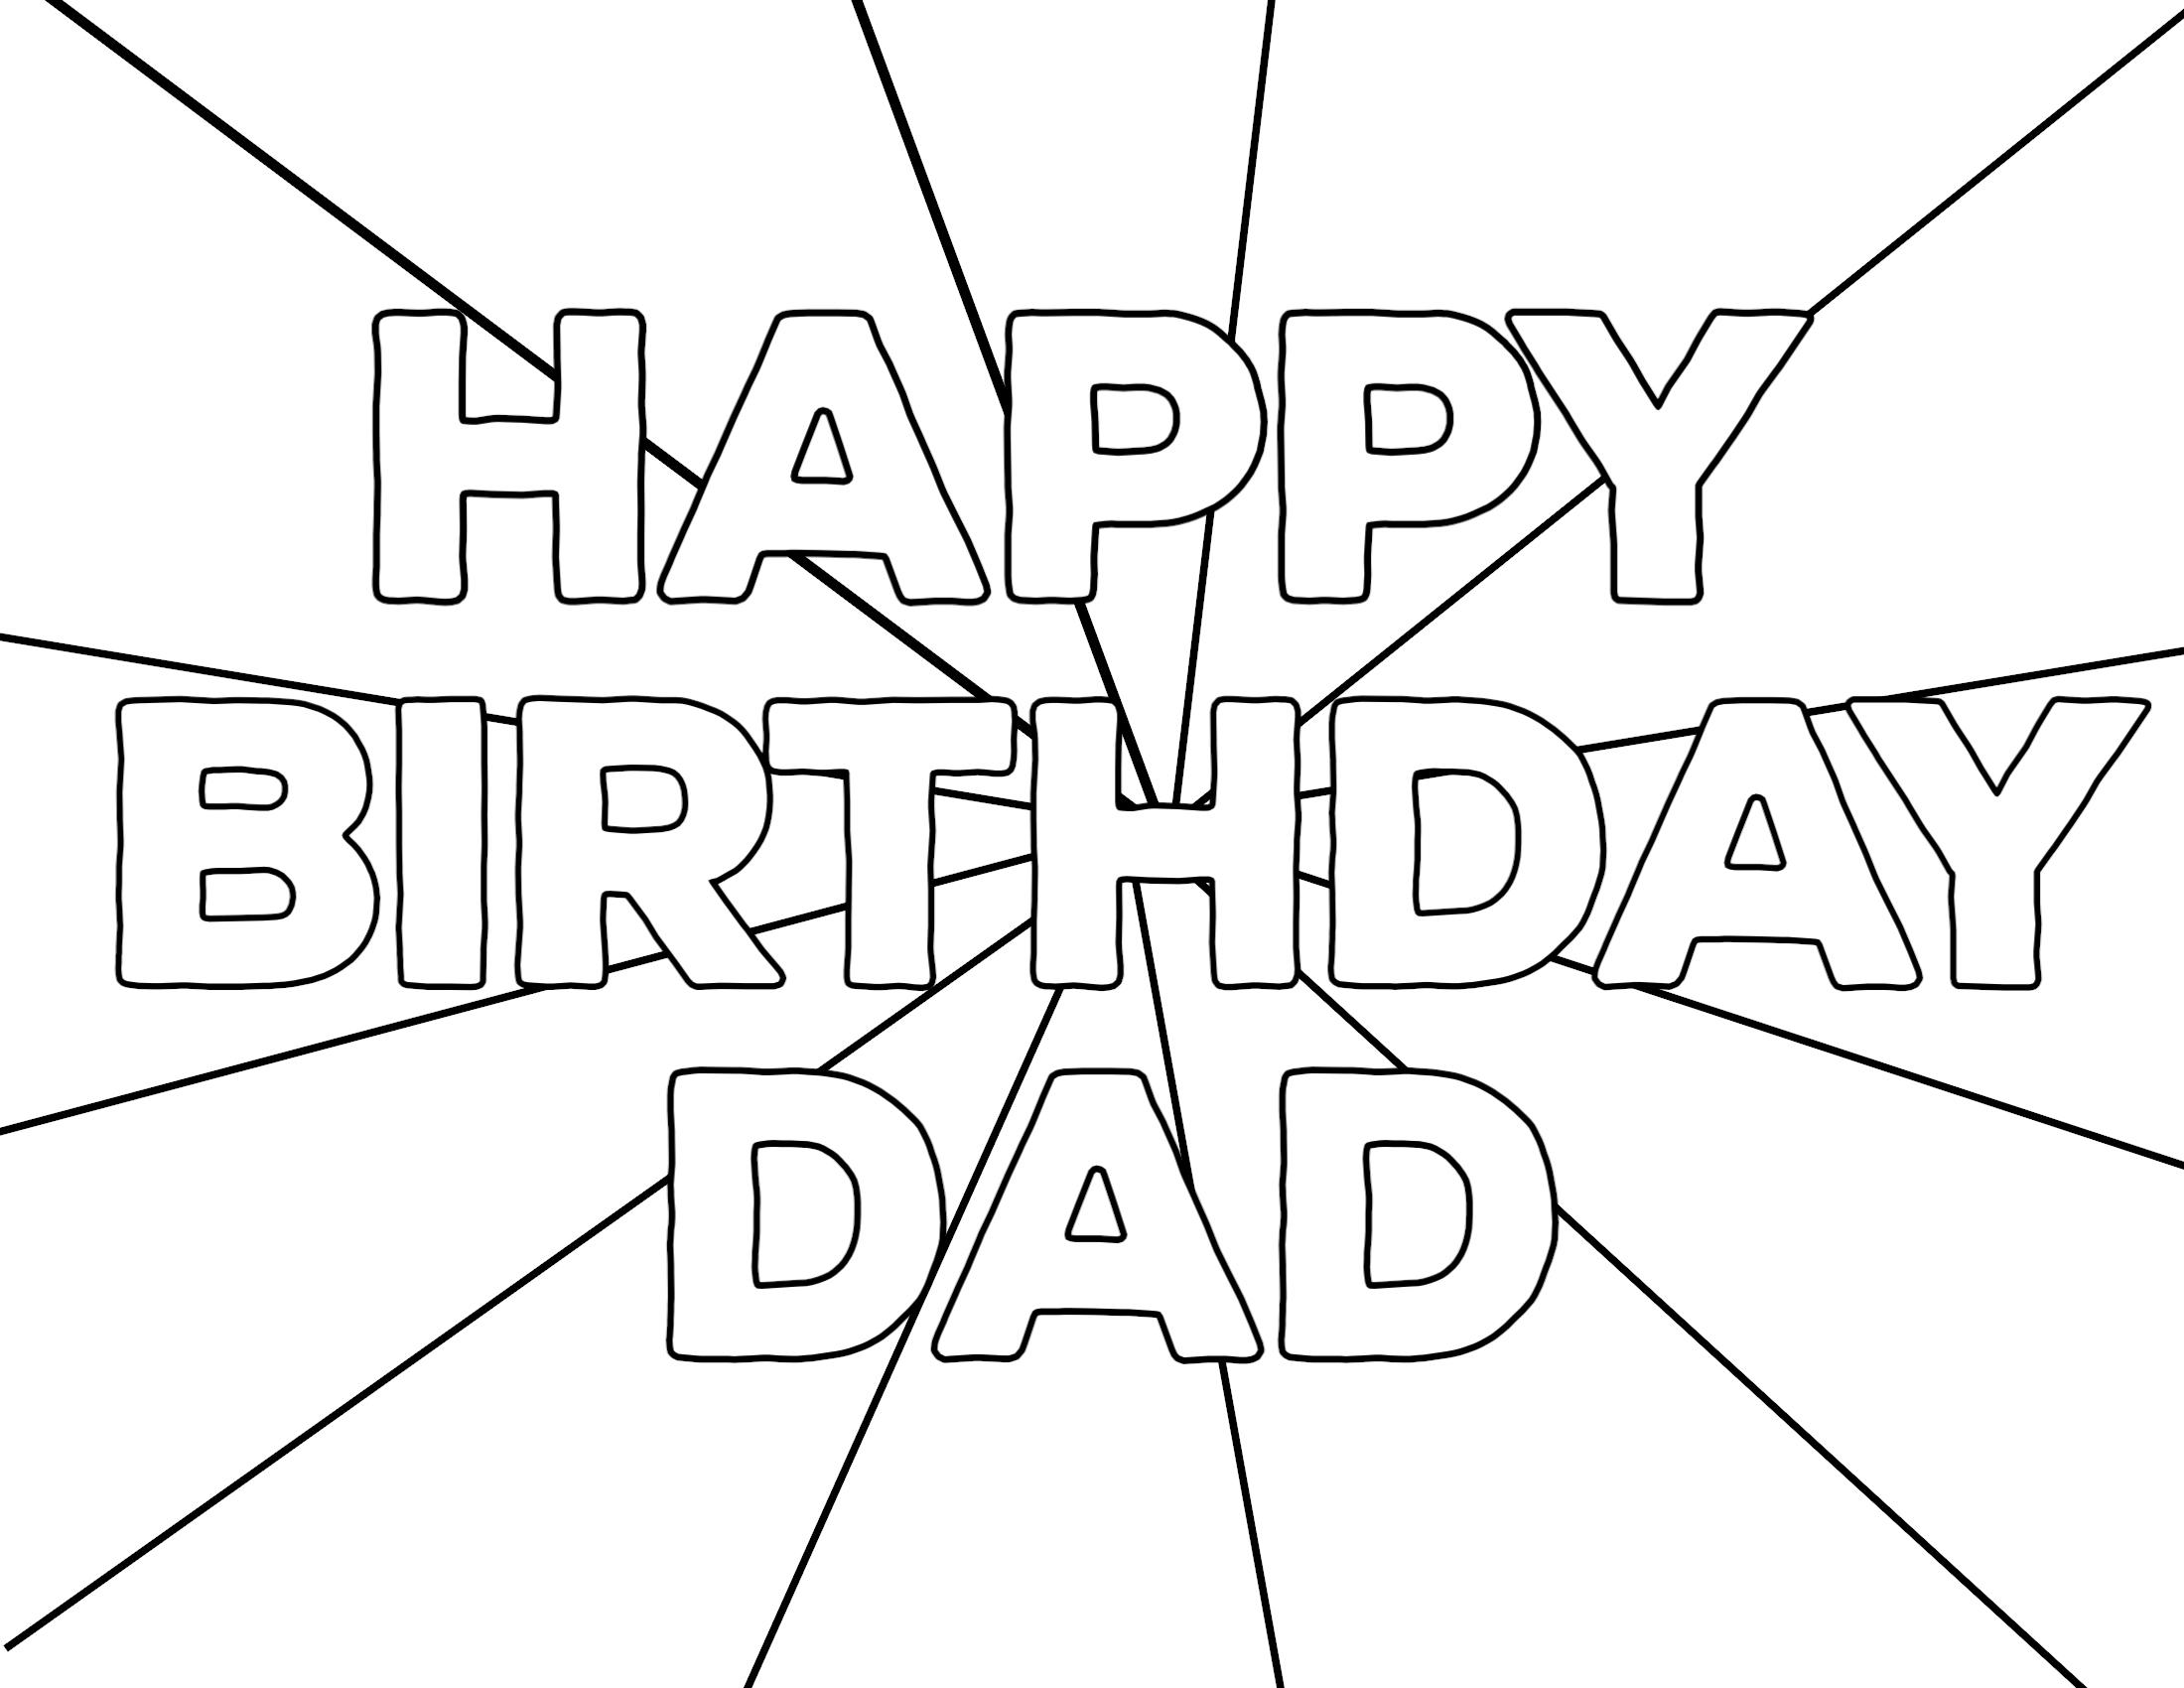 Dad birthday Coloring Page